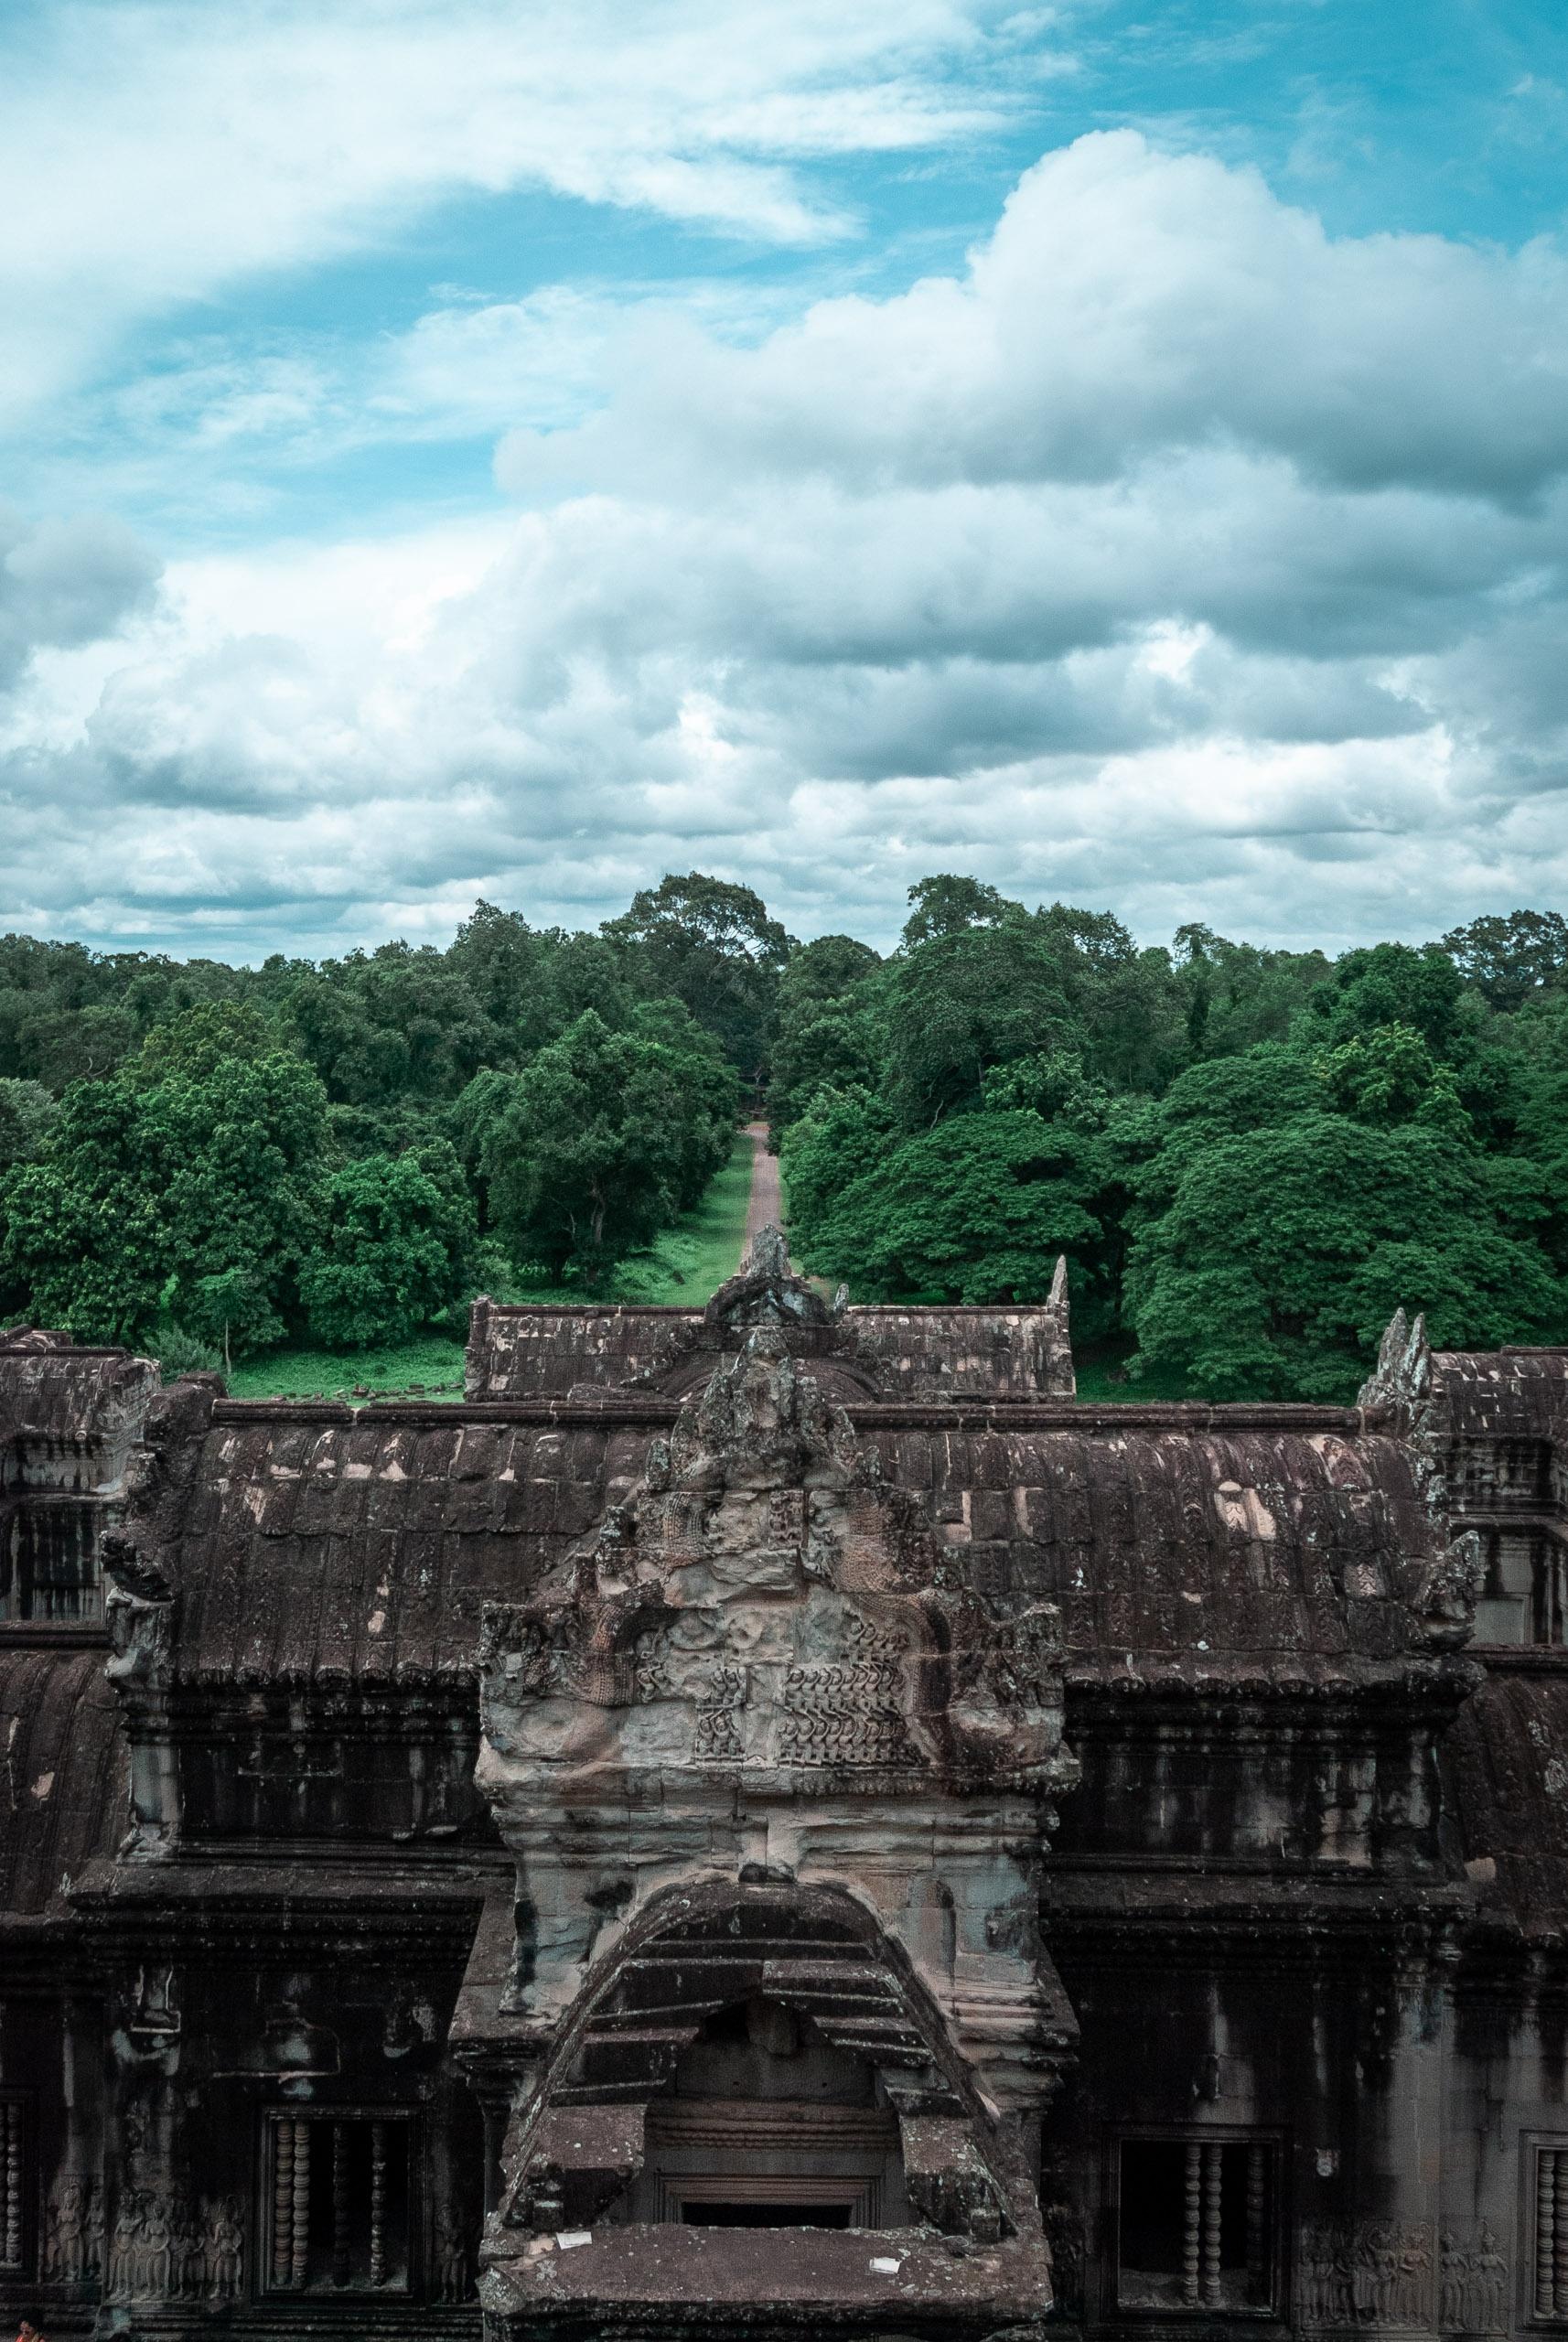 Cambodia - Angkor Wat - 2007-0626-DSC_0328_46533